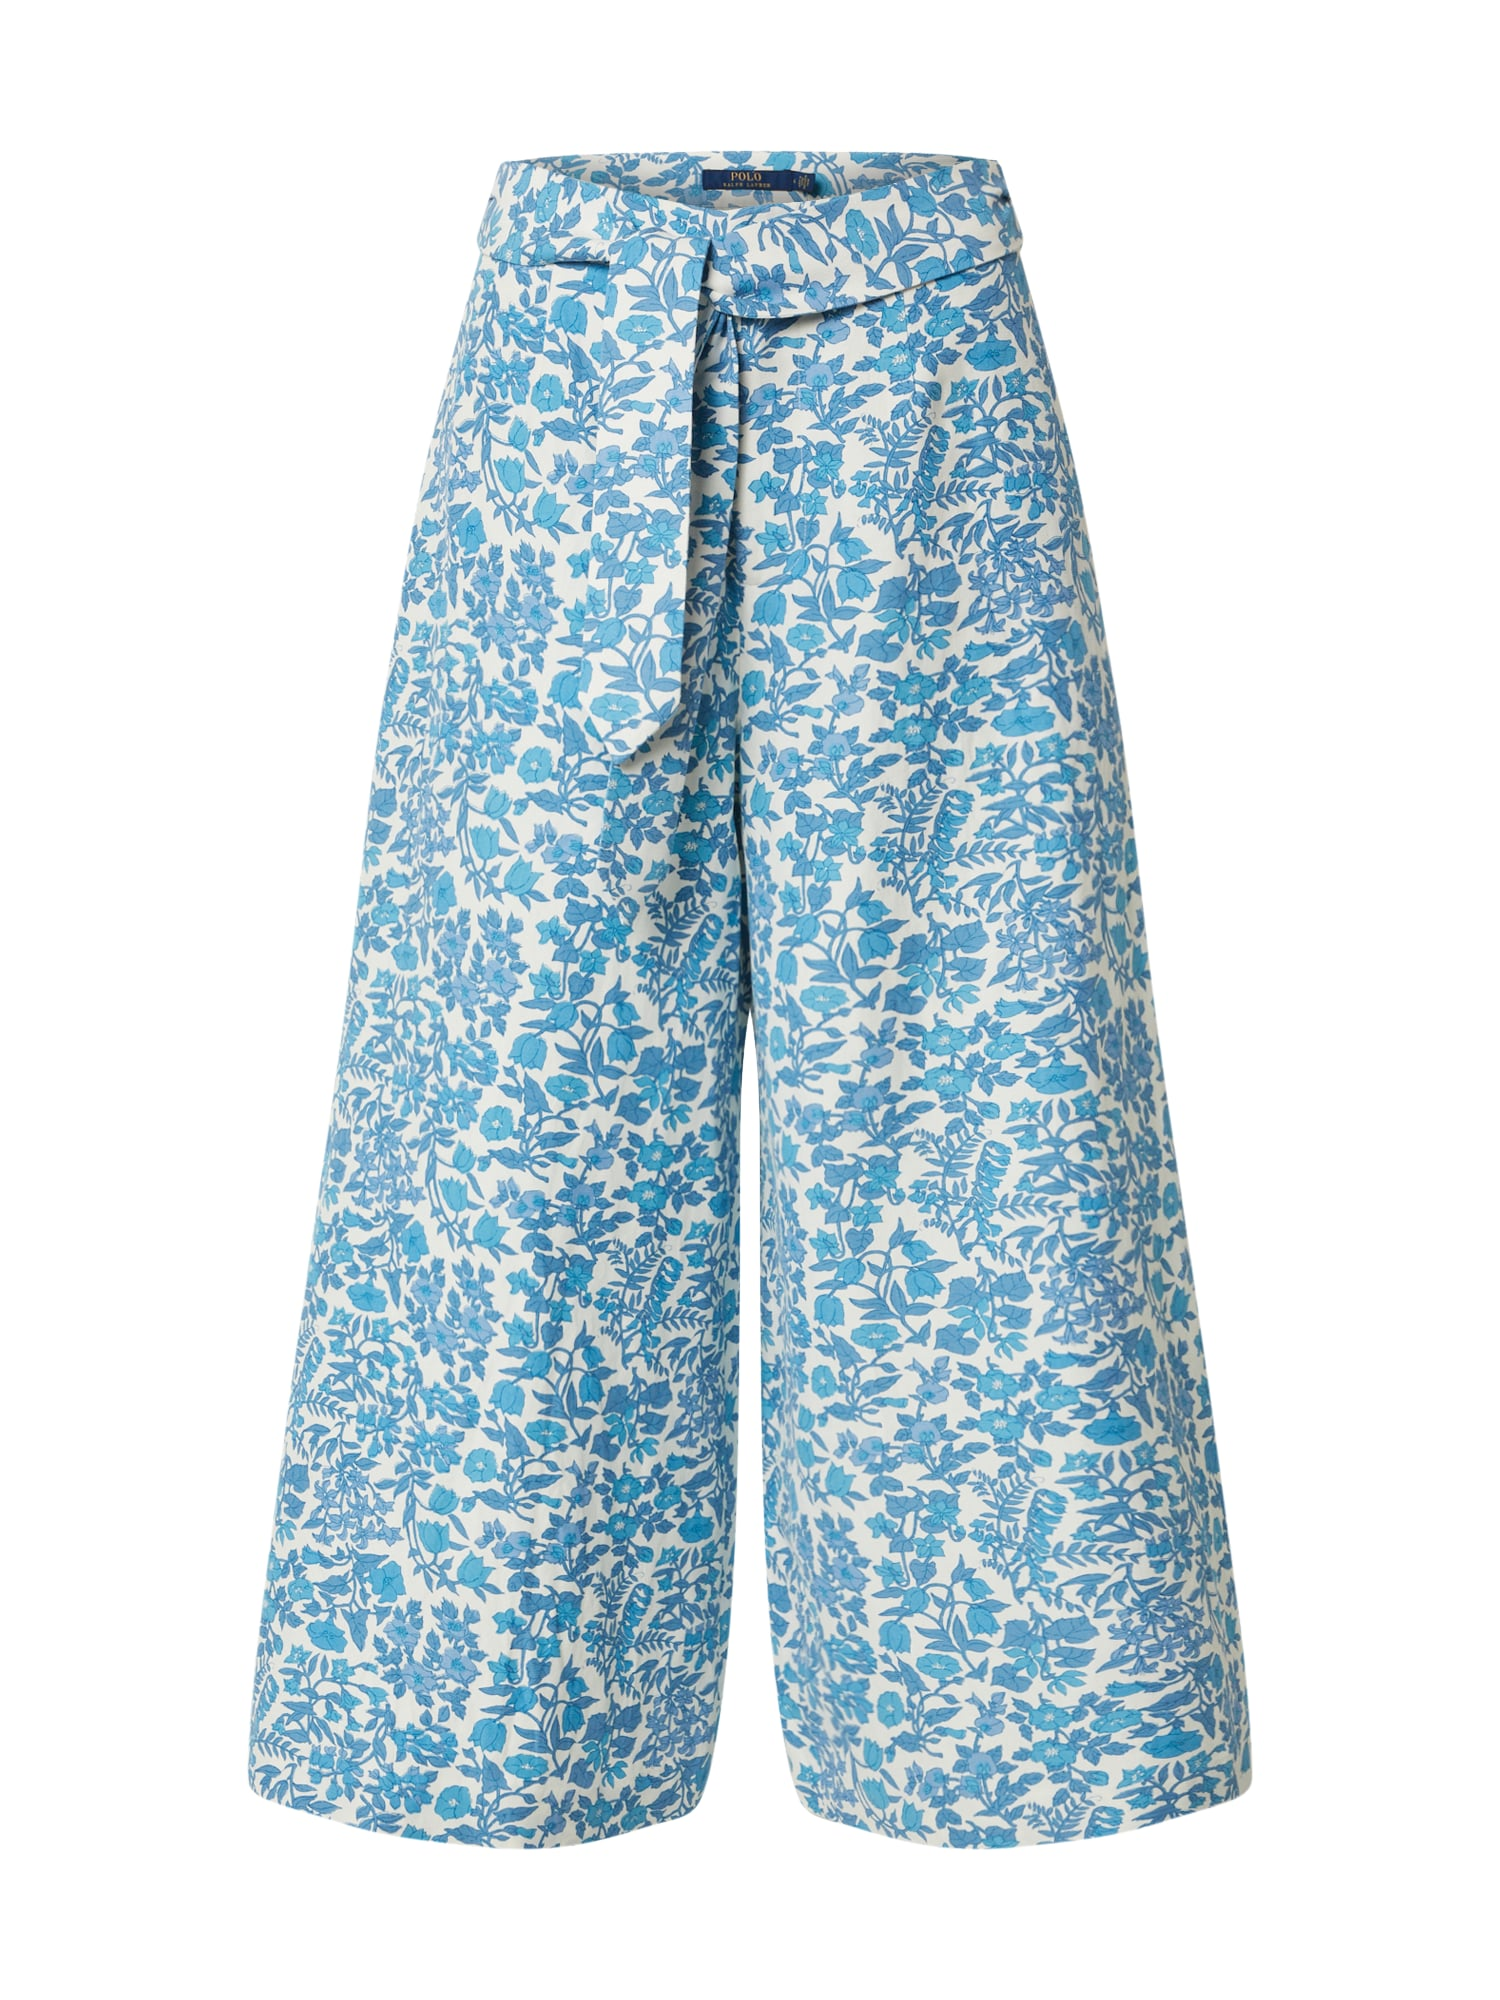 POLO RALPH LAUREN Kelnės 'KLY PT-WIDE LEG-PANT' balta / mėlyna